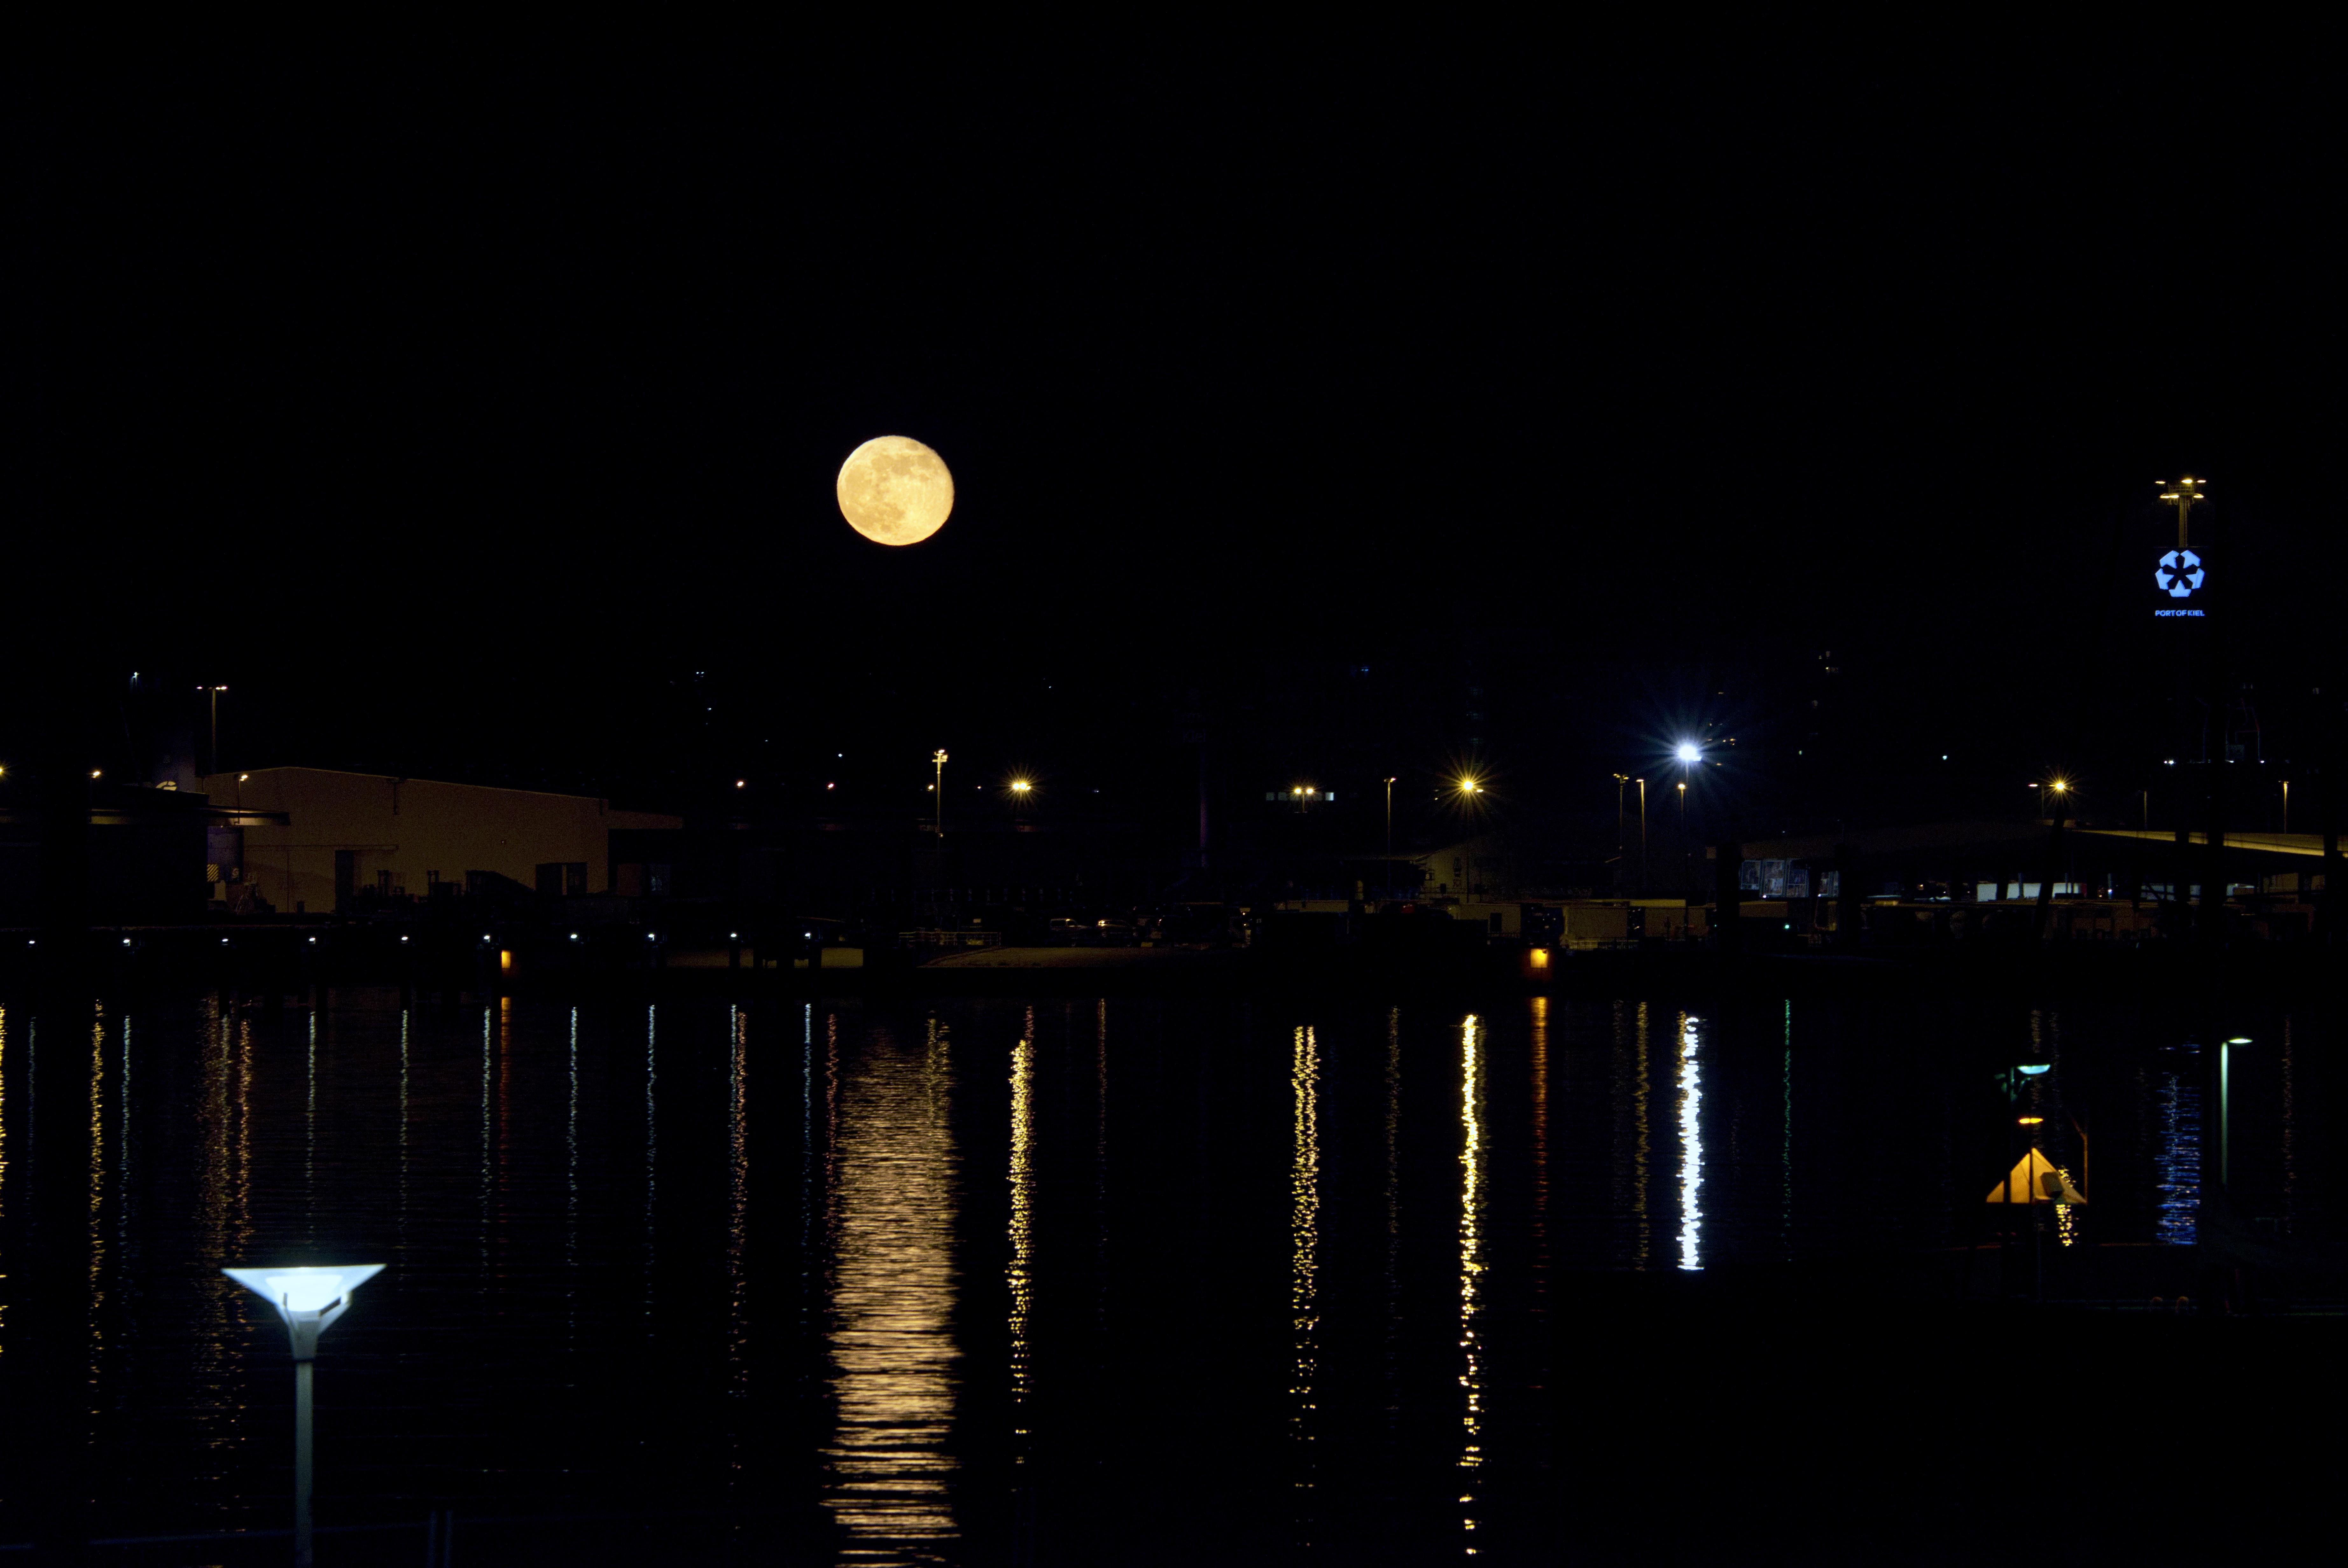 Moon over Kiel Fjord